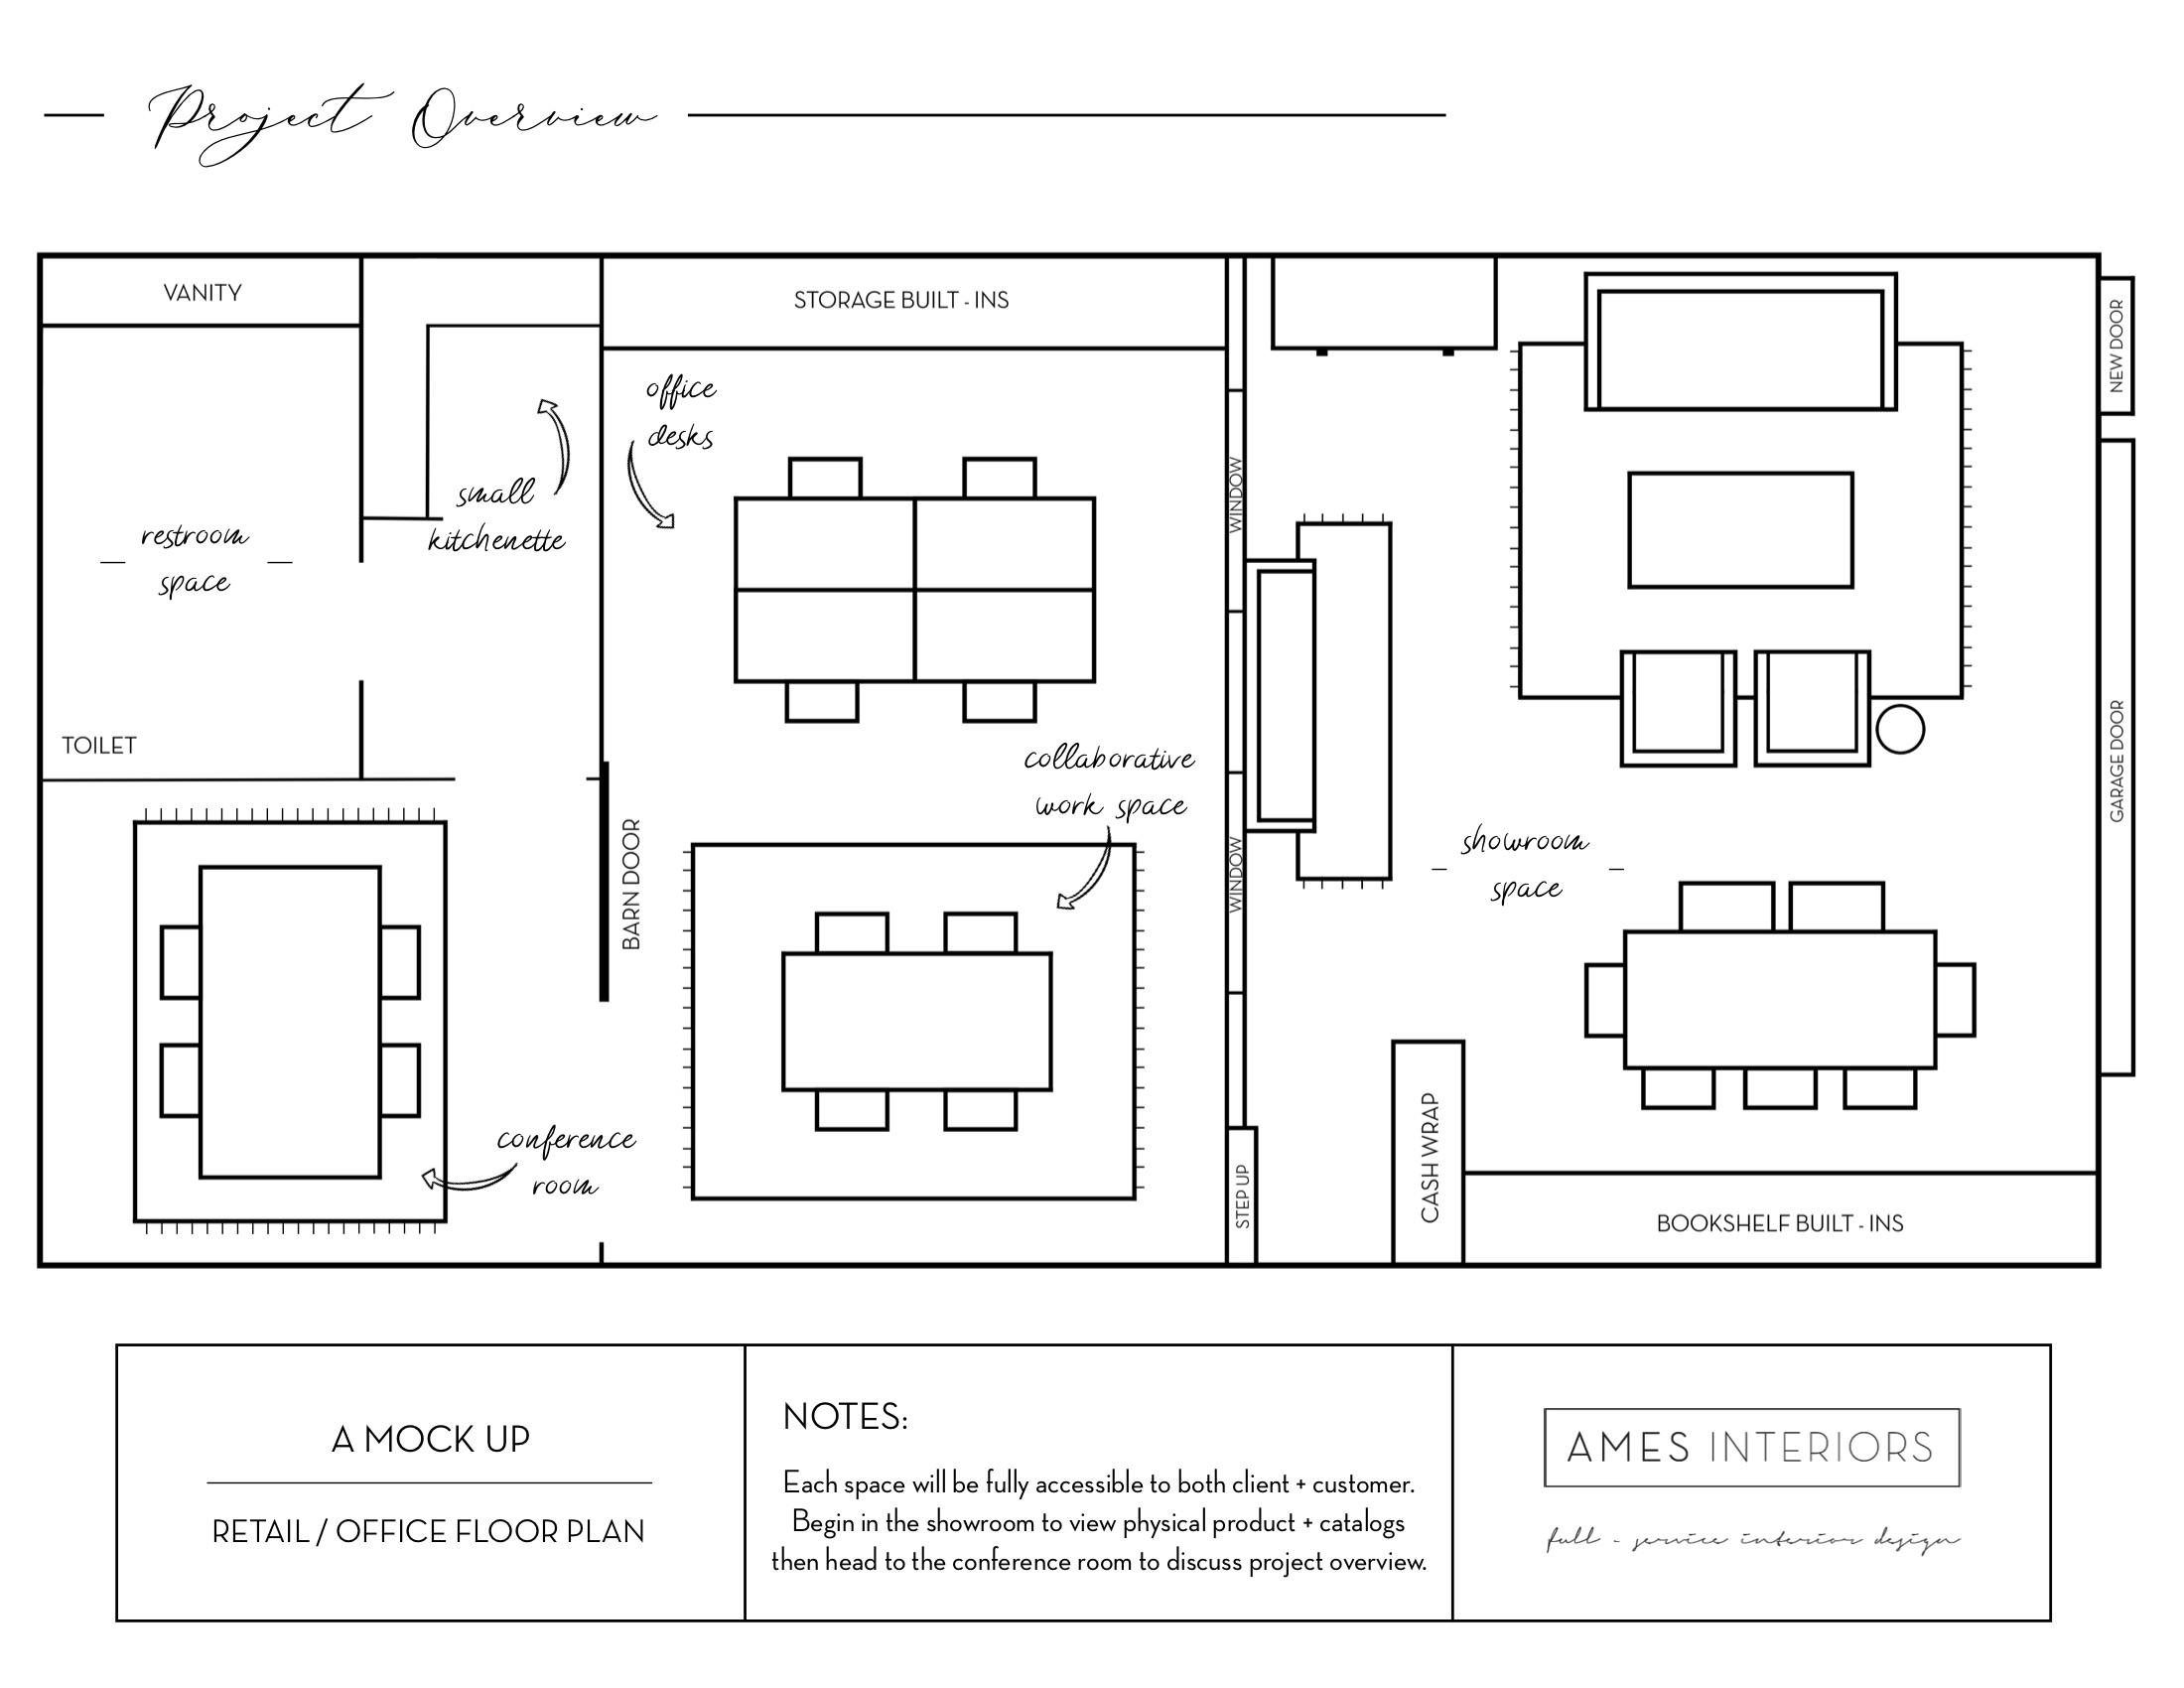 Ames Interiors Retail & Office.jpg